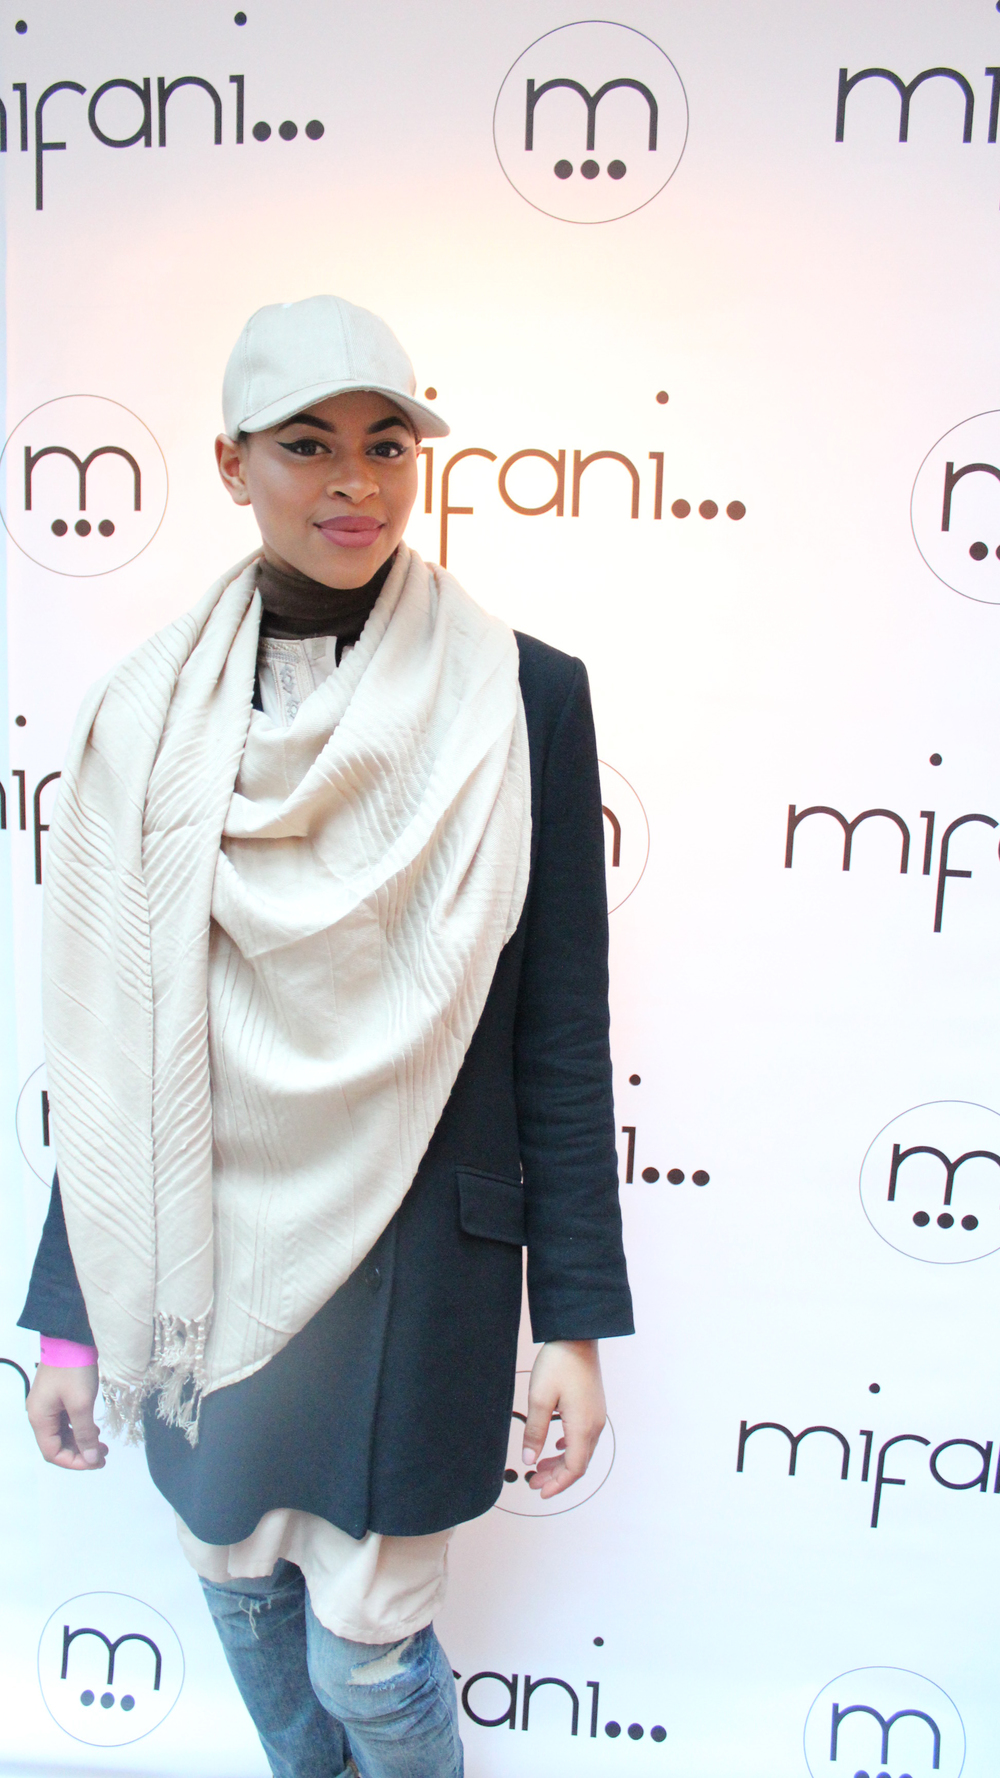 Amira McCarthy